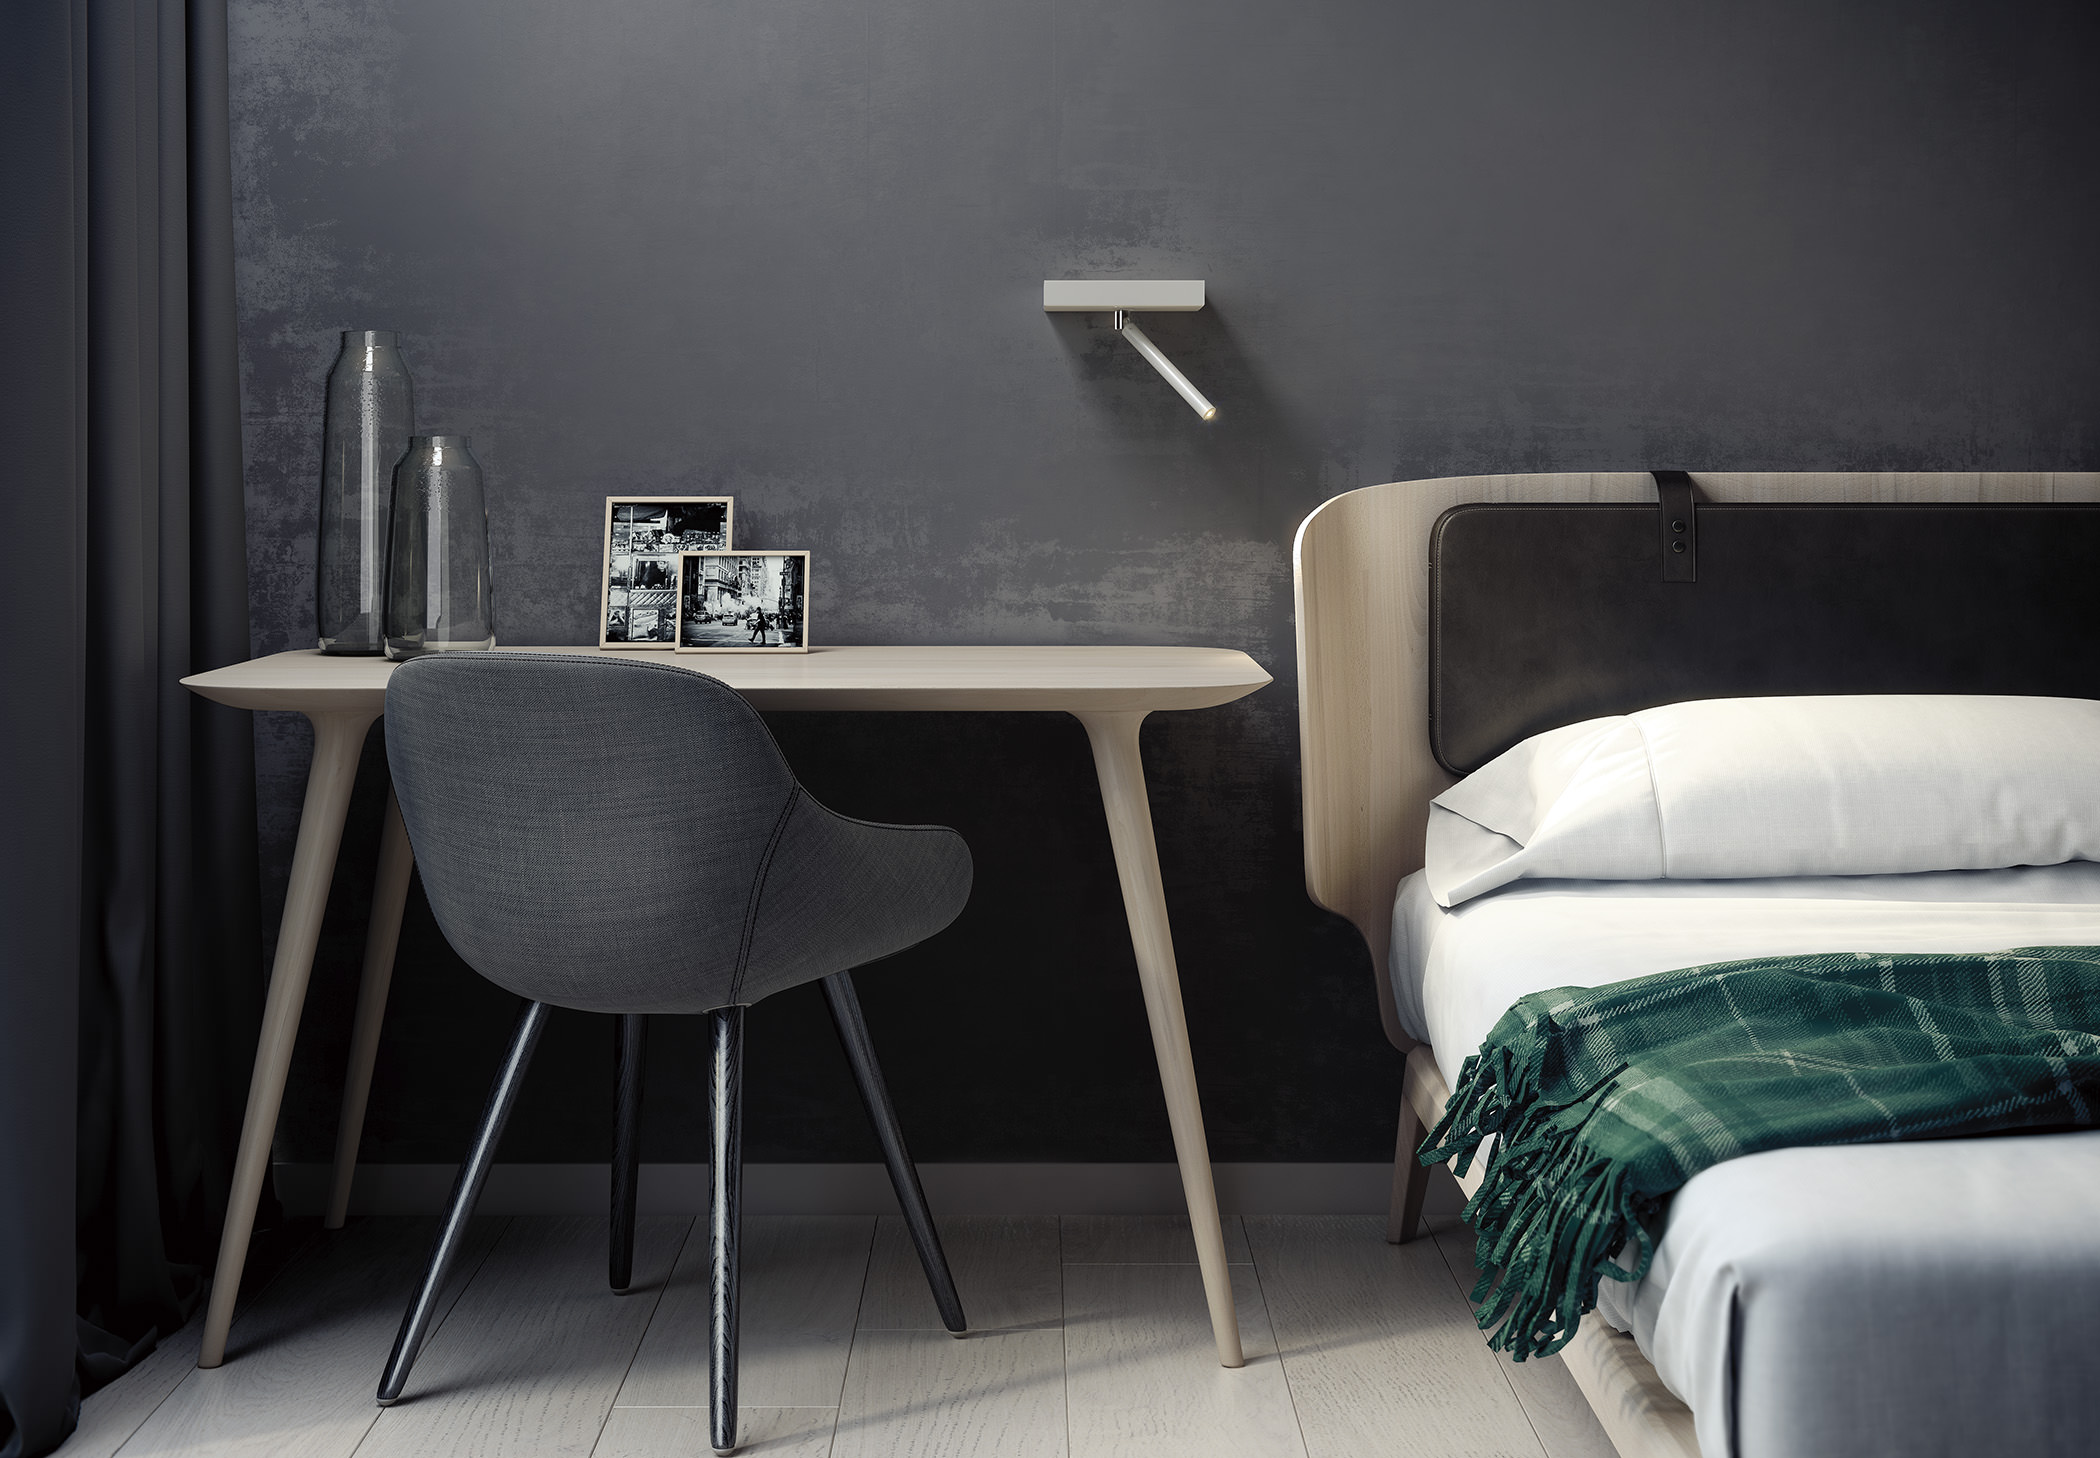 Nit A 3520 Wall Lamp Estiluz Image Ambient 01